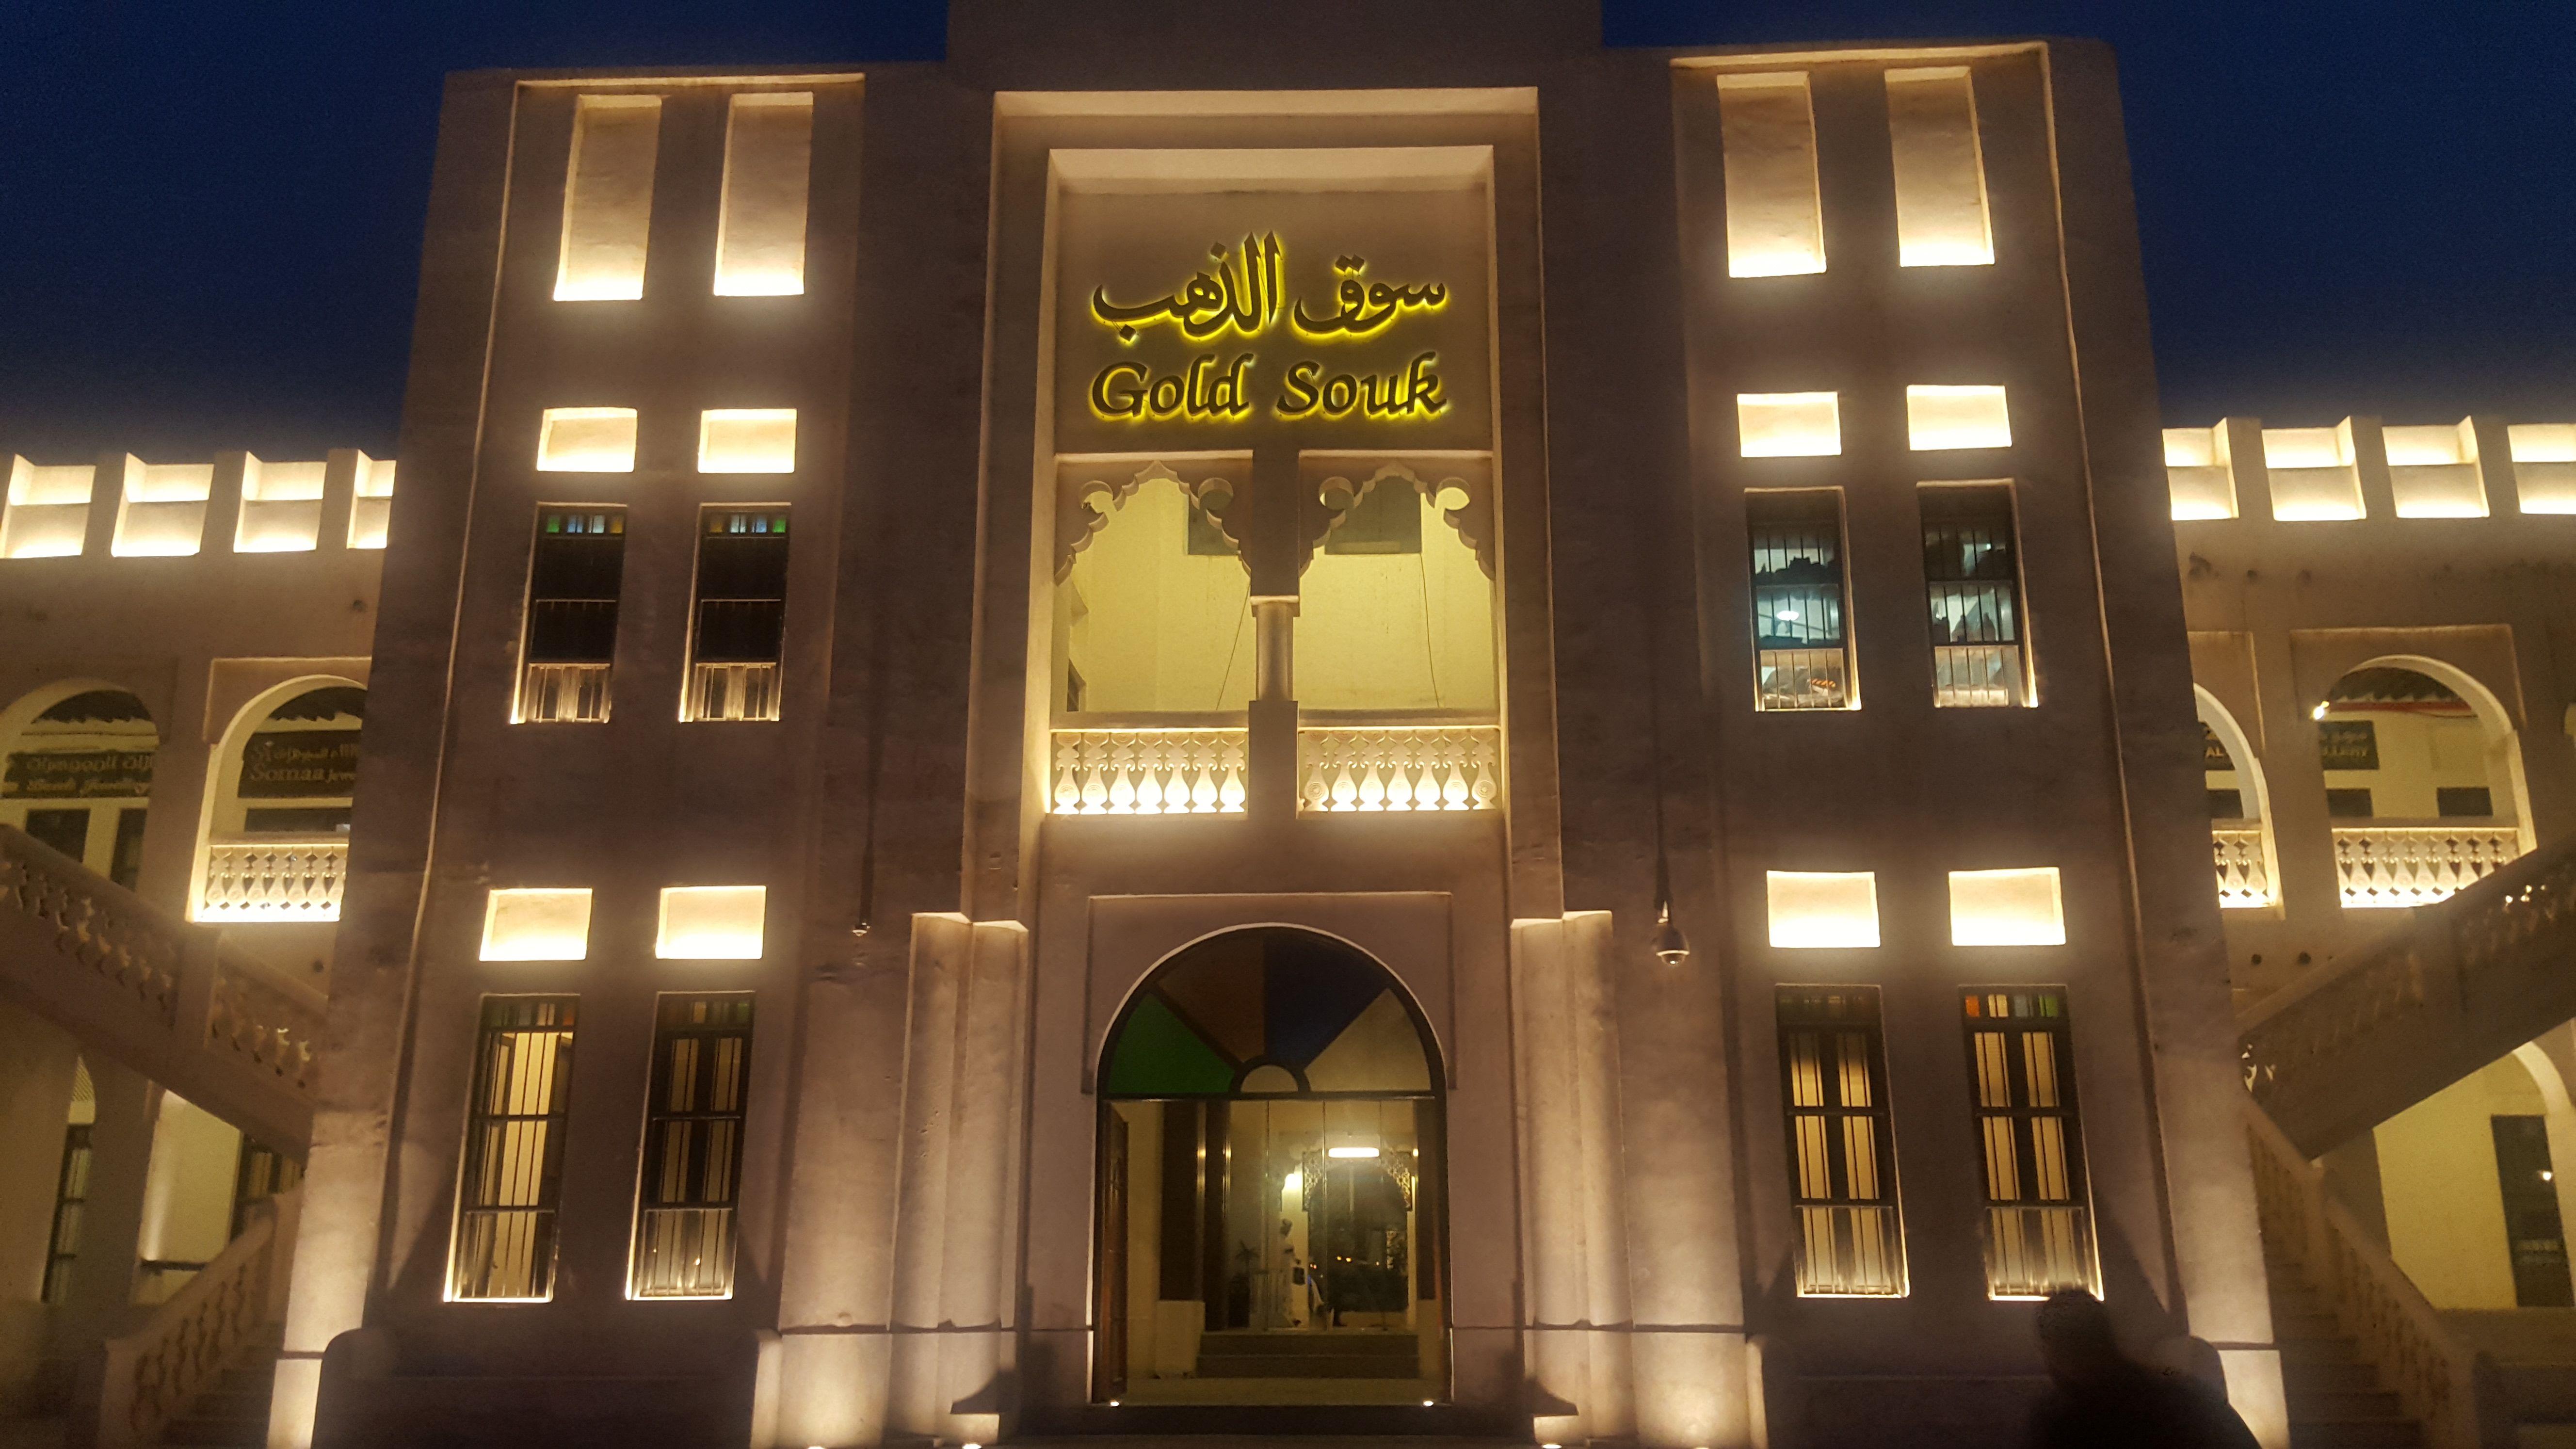 Gold Souq, Souq Waqif, Doha, Qatar | Nexo Luce Architectural